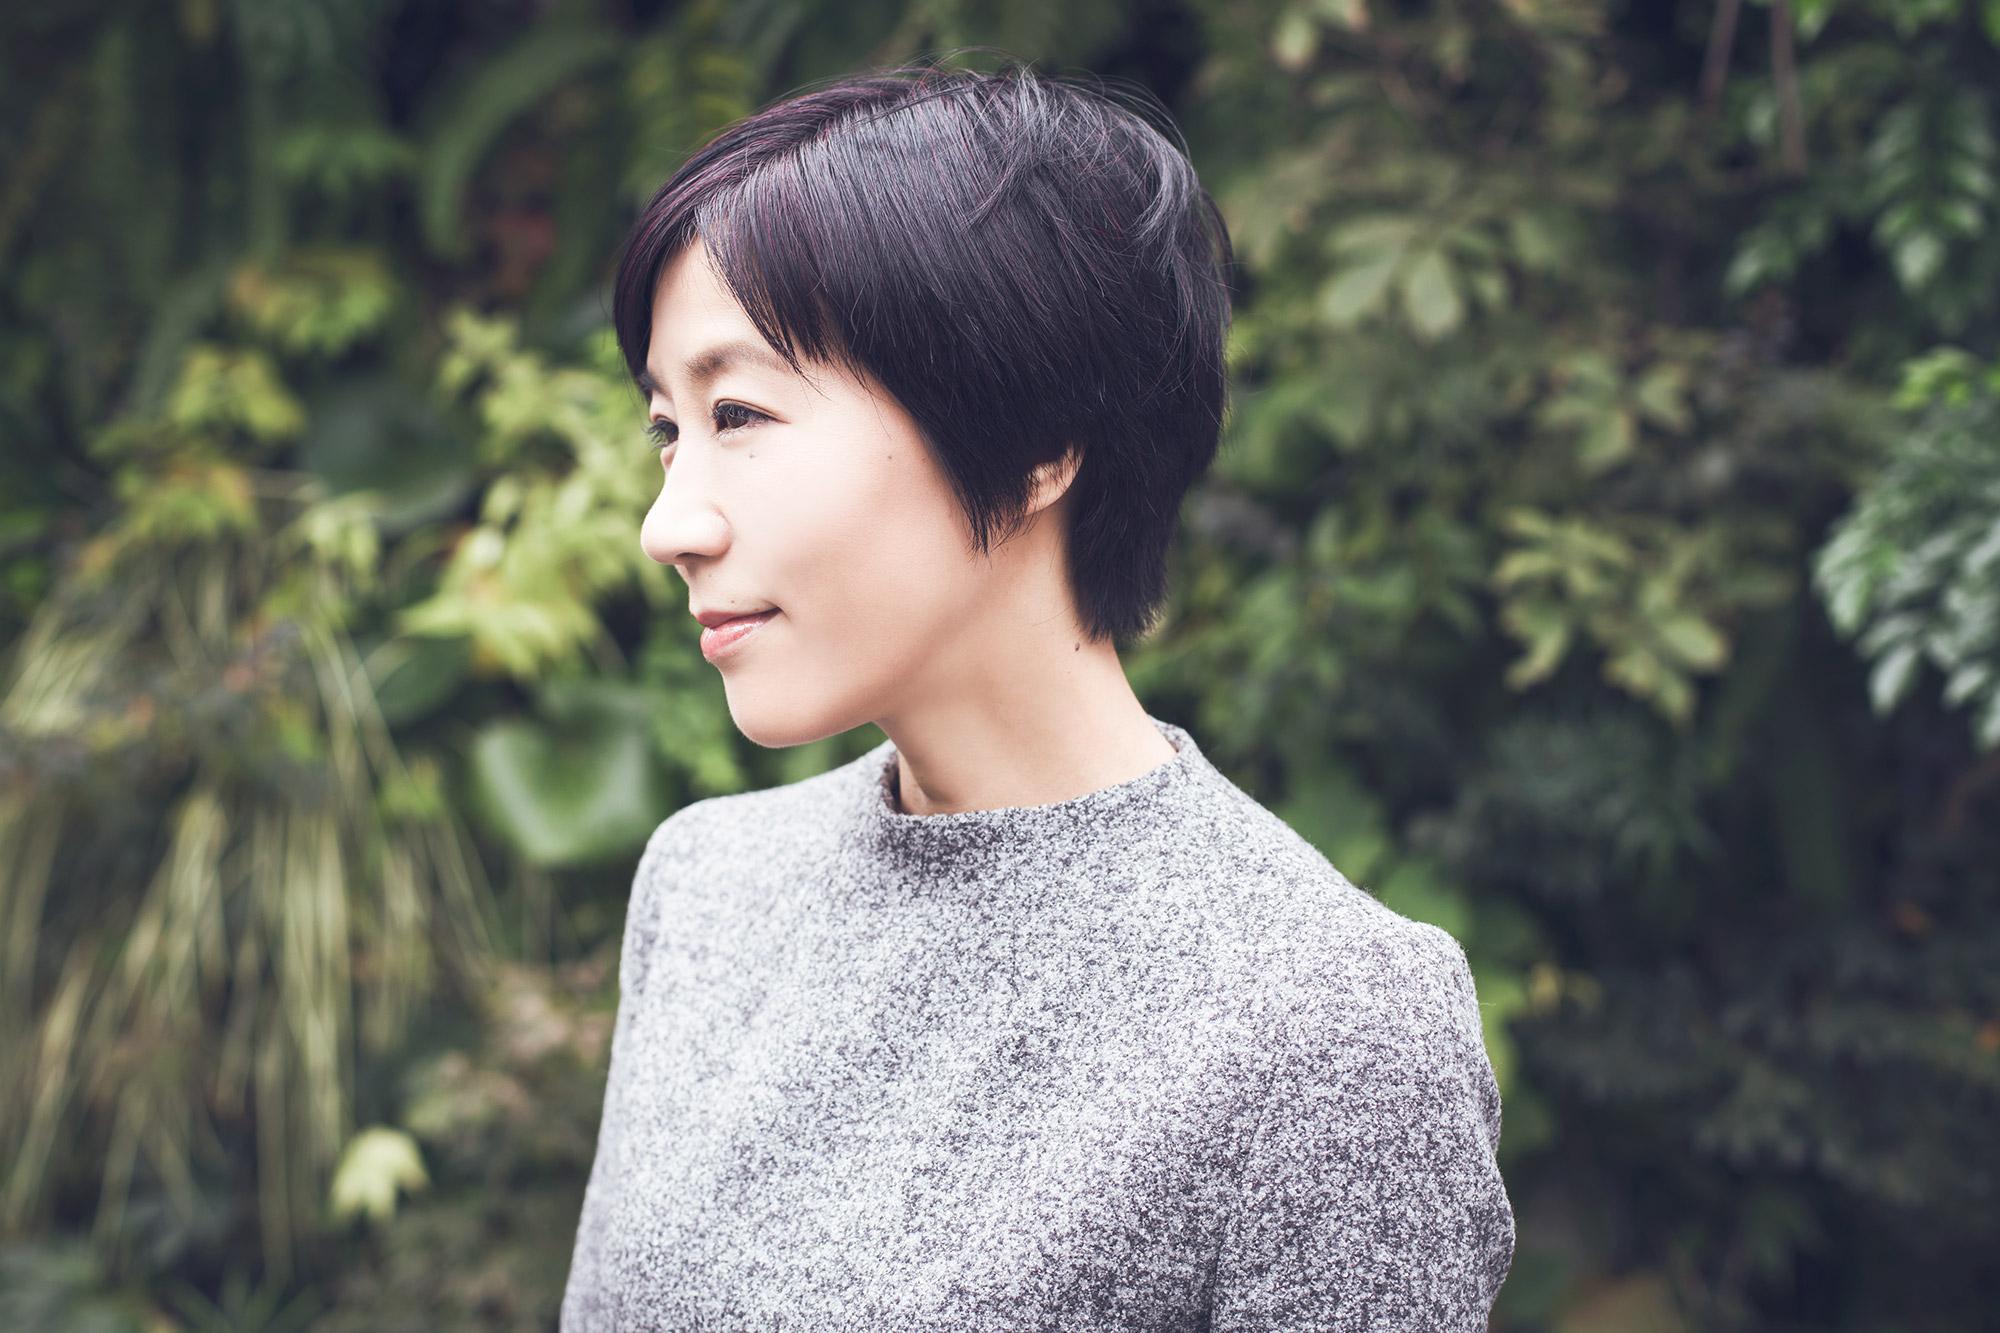 A Genre Herself: Yoko Kanno | KMFA 89.5 | Austin's Classical Music Radio  Station